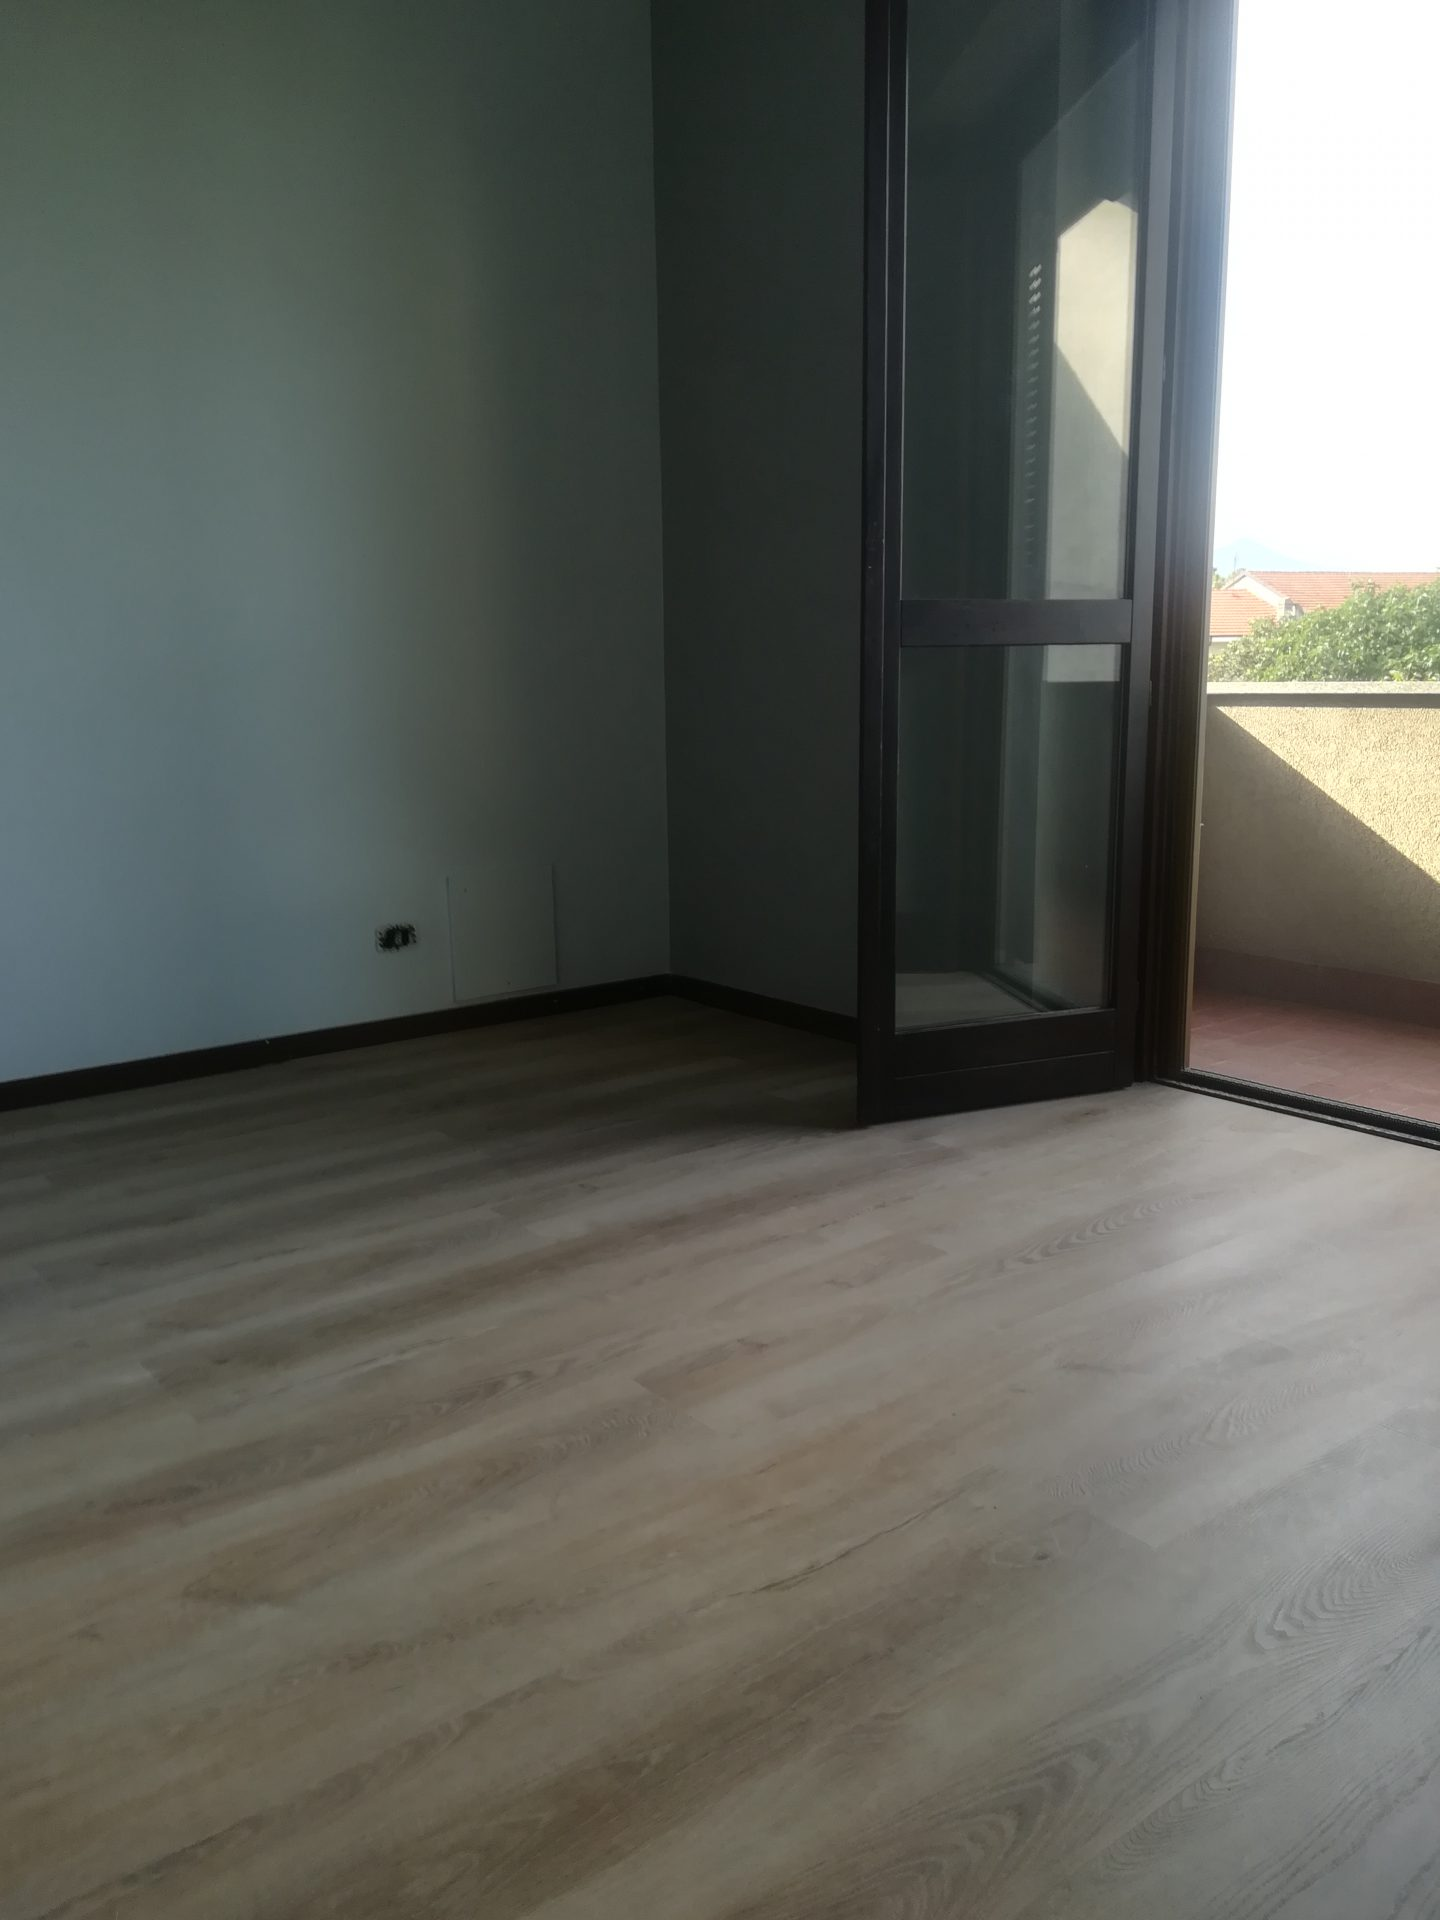 Dettaglio sala con pavimento vinilico